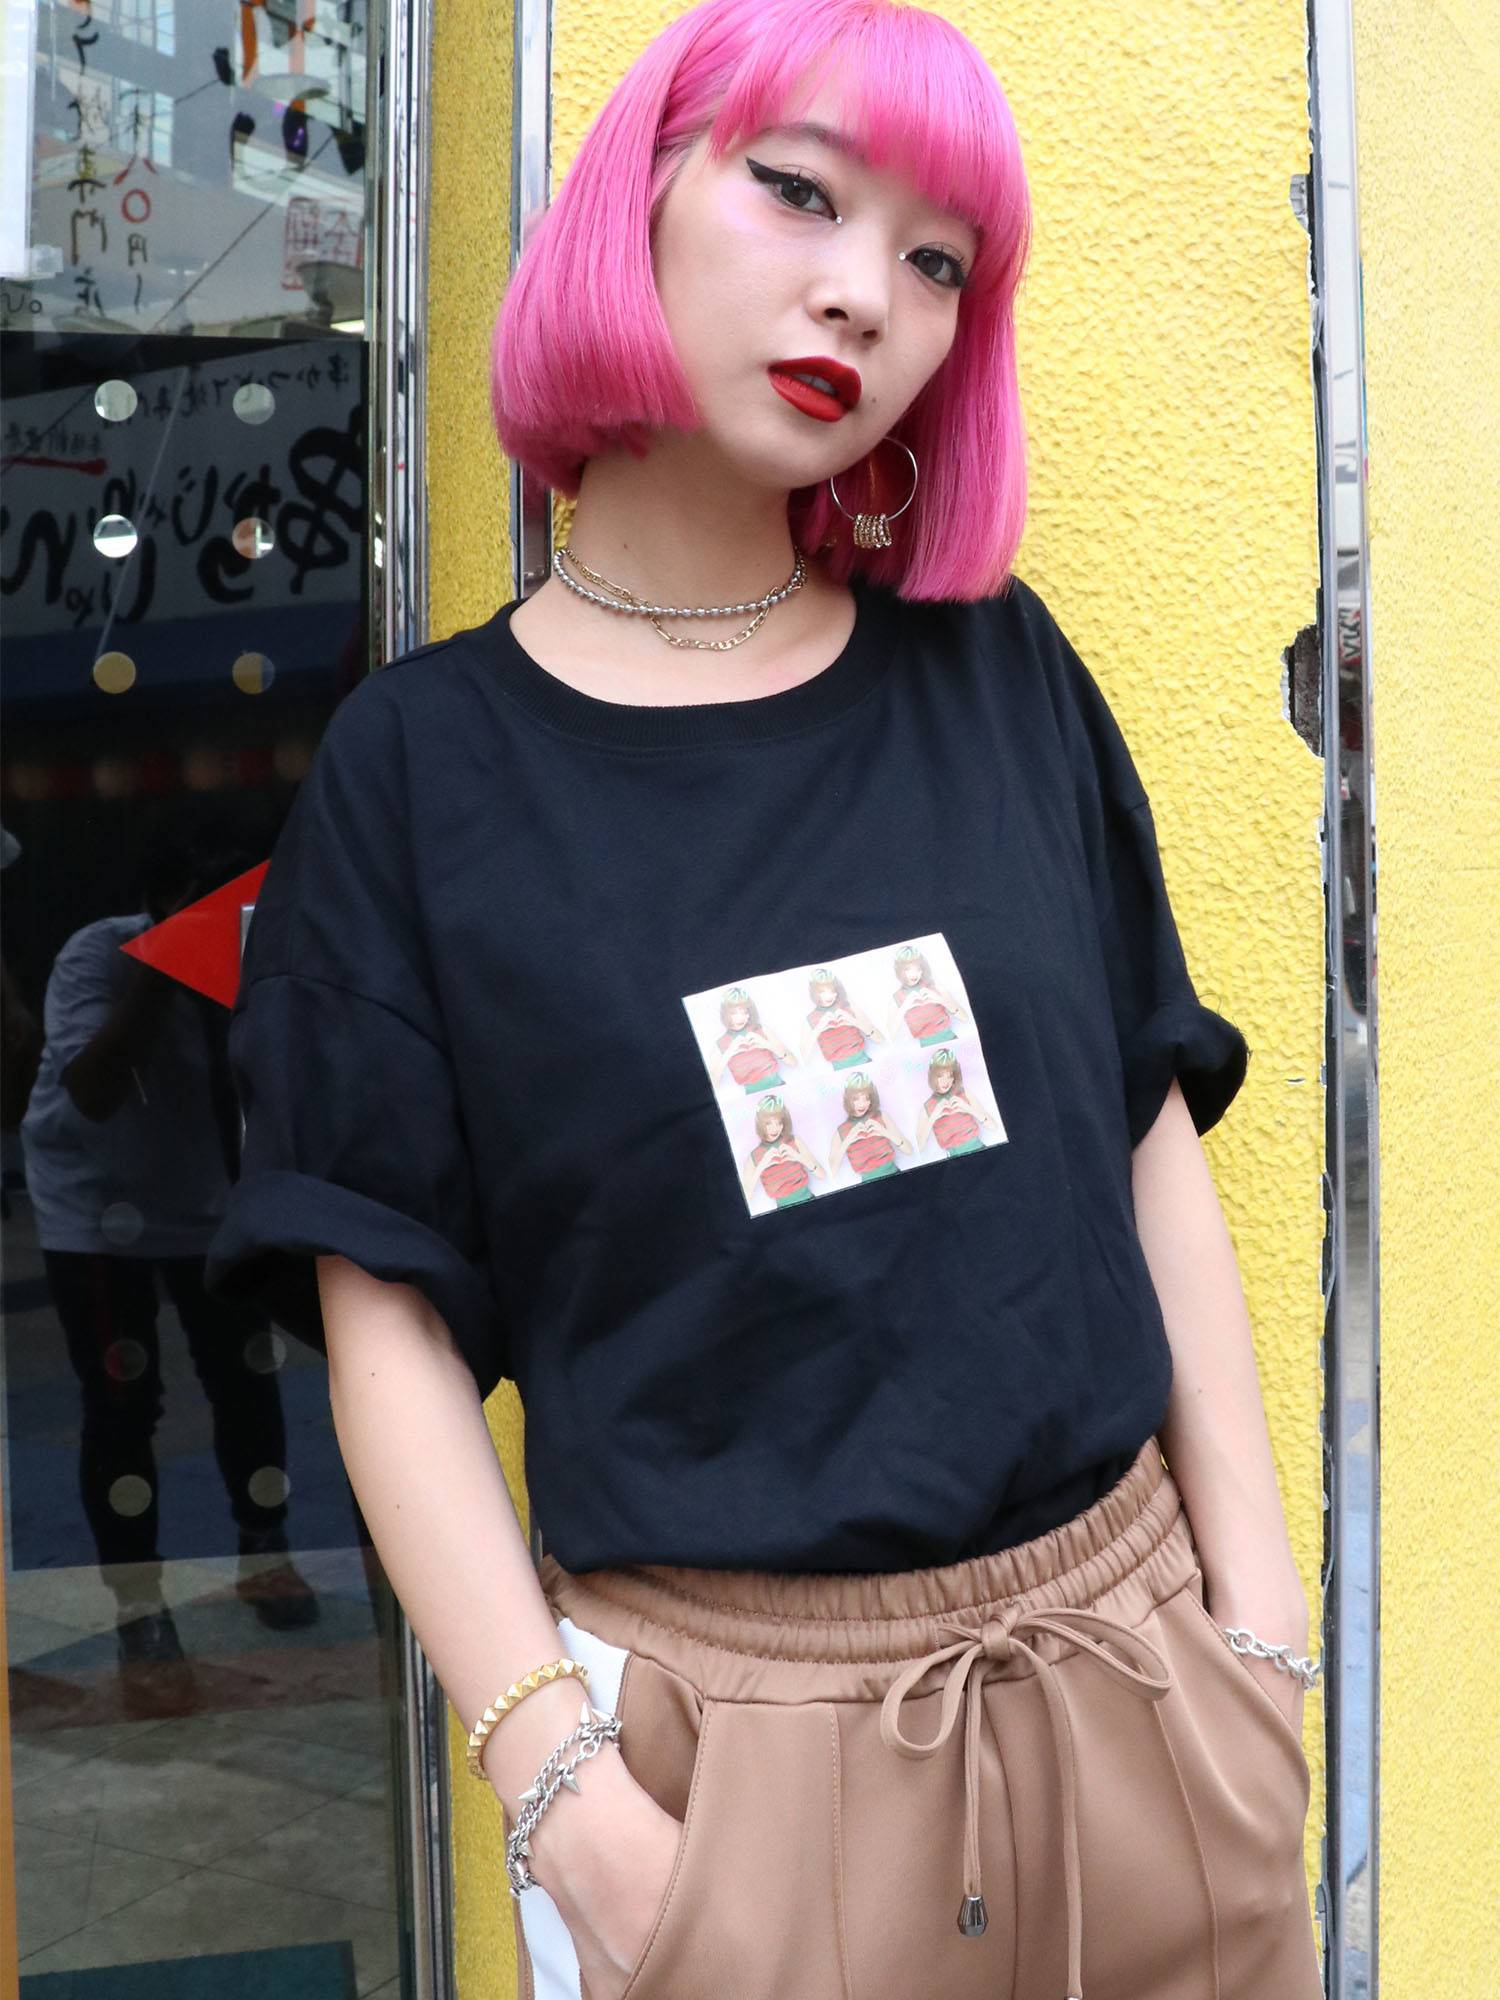 Photo booth girl T-shirt